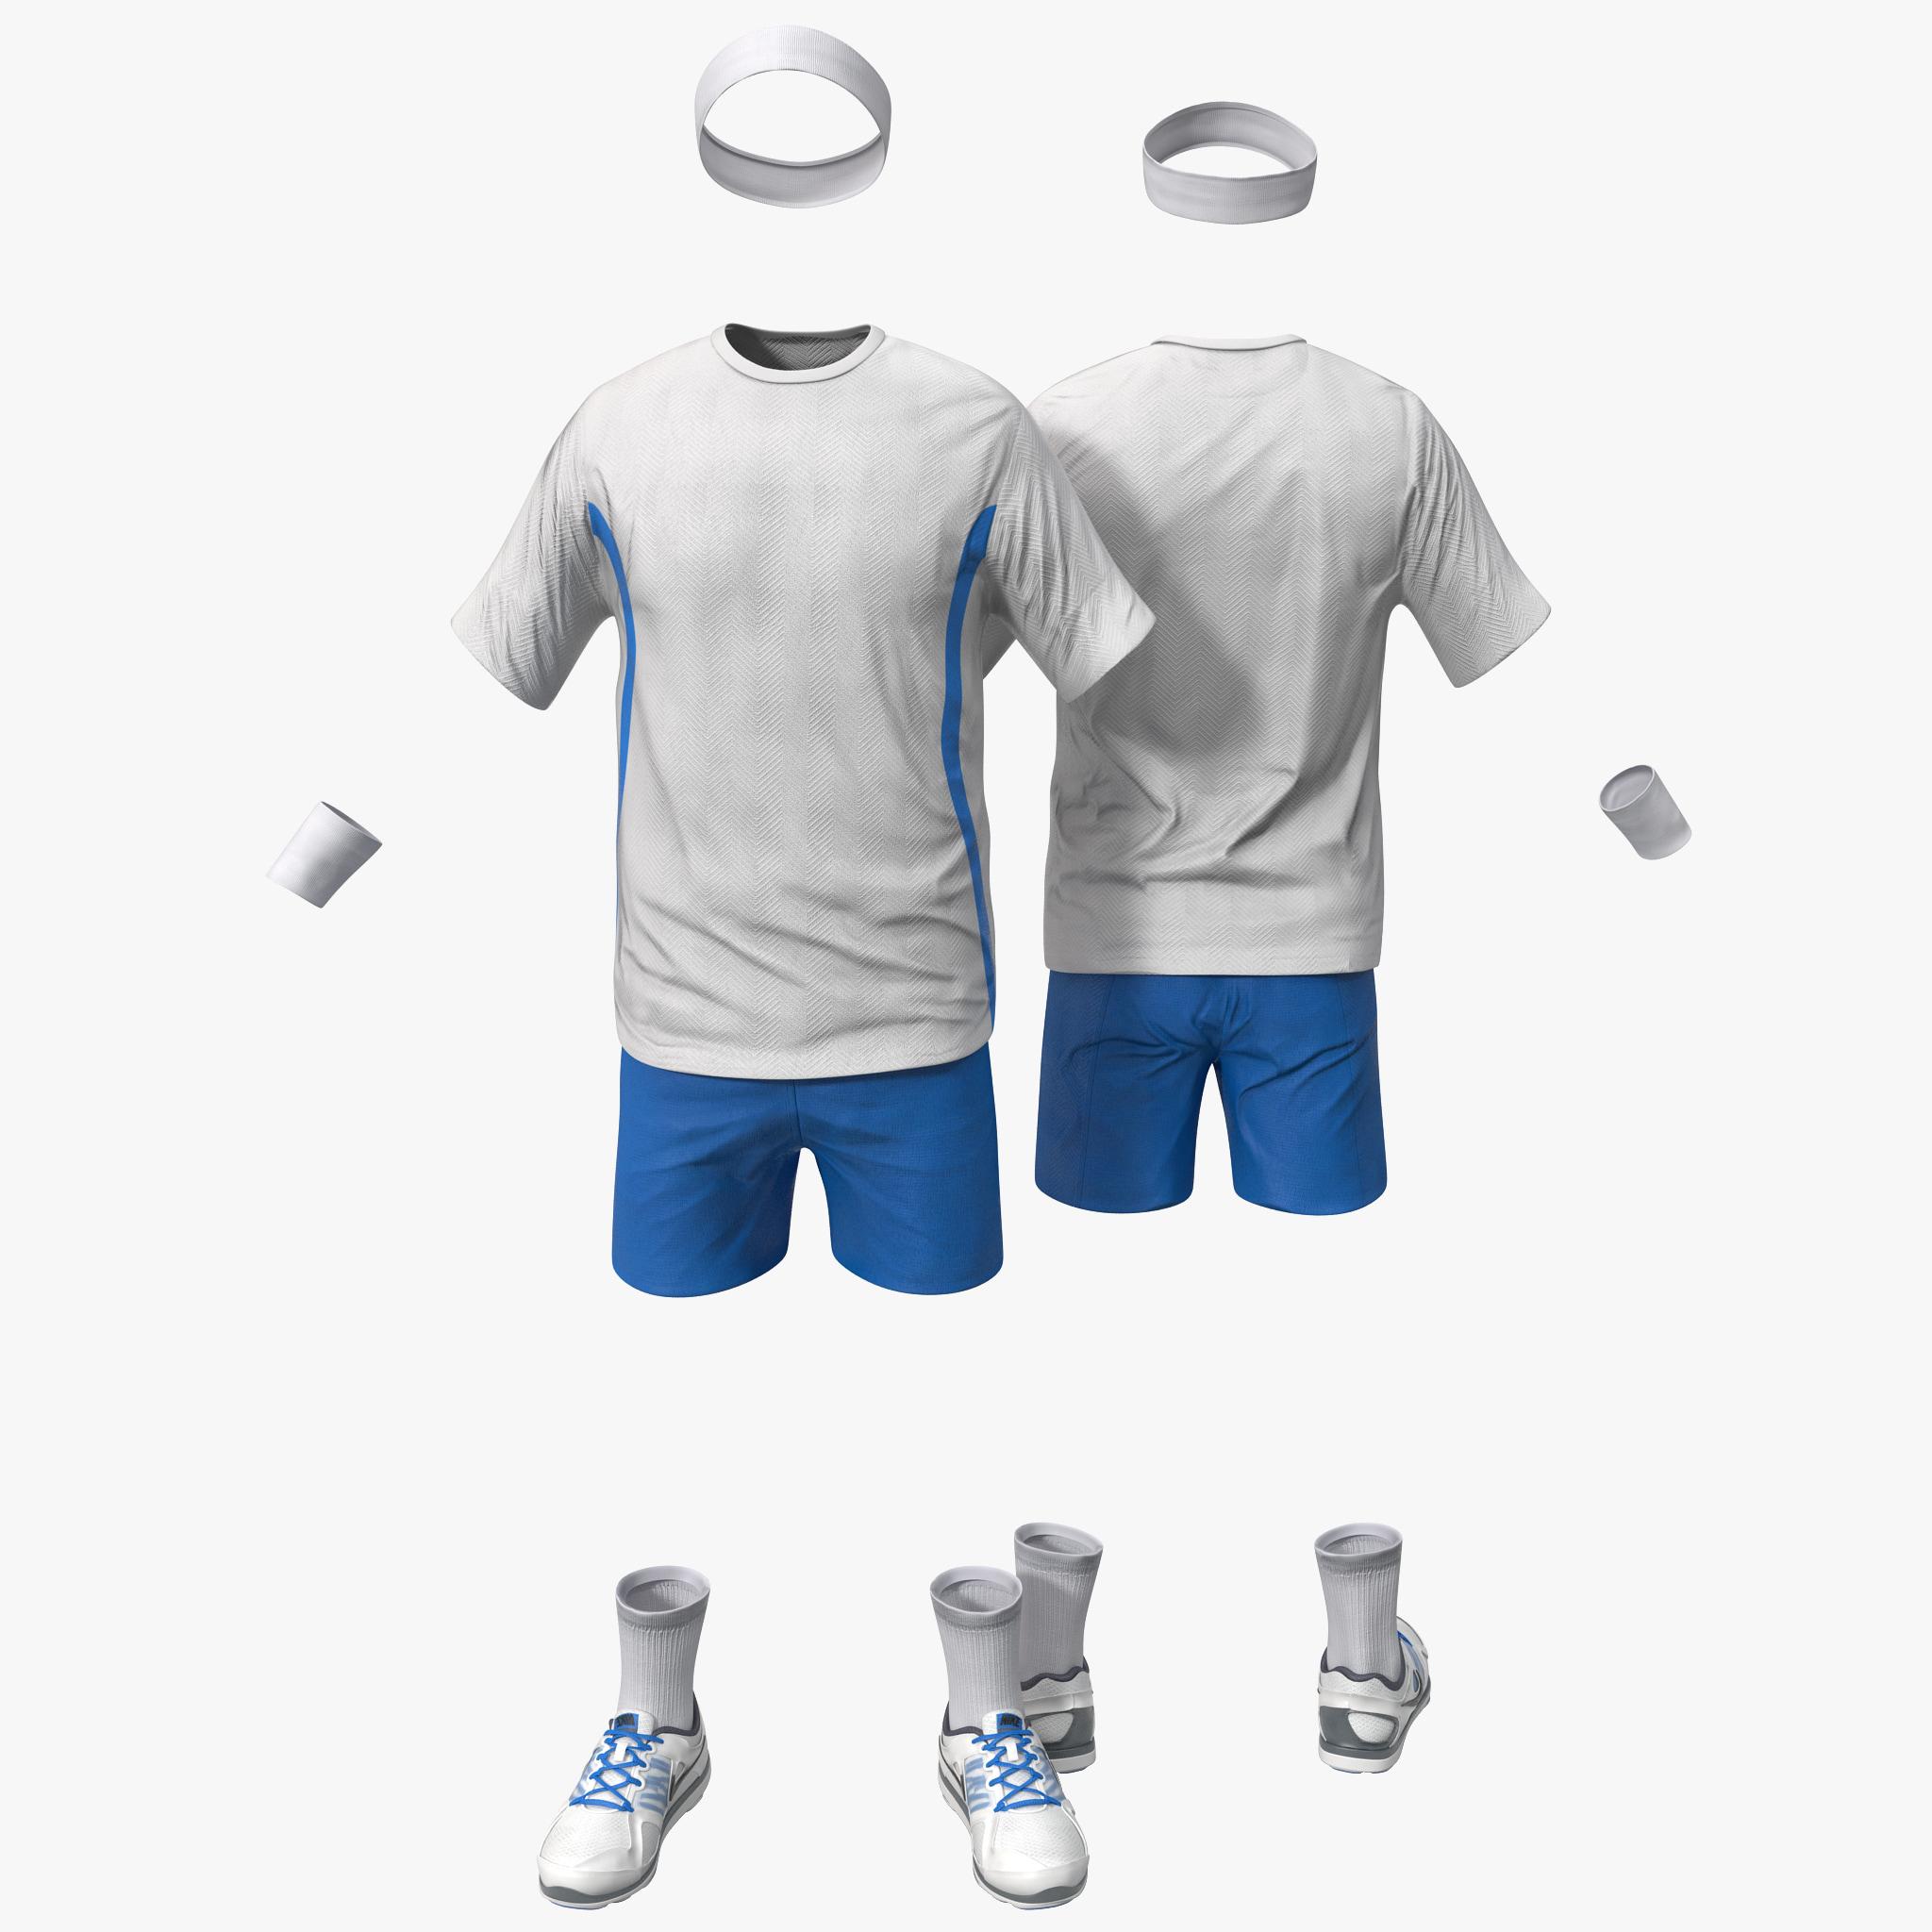 Tennis Clothes